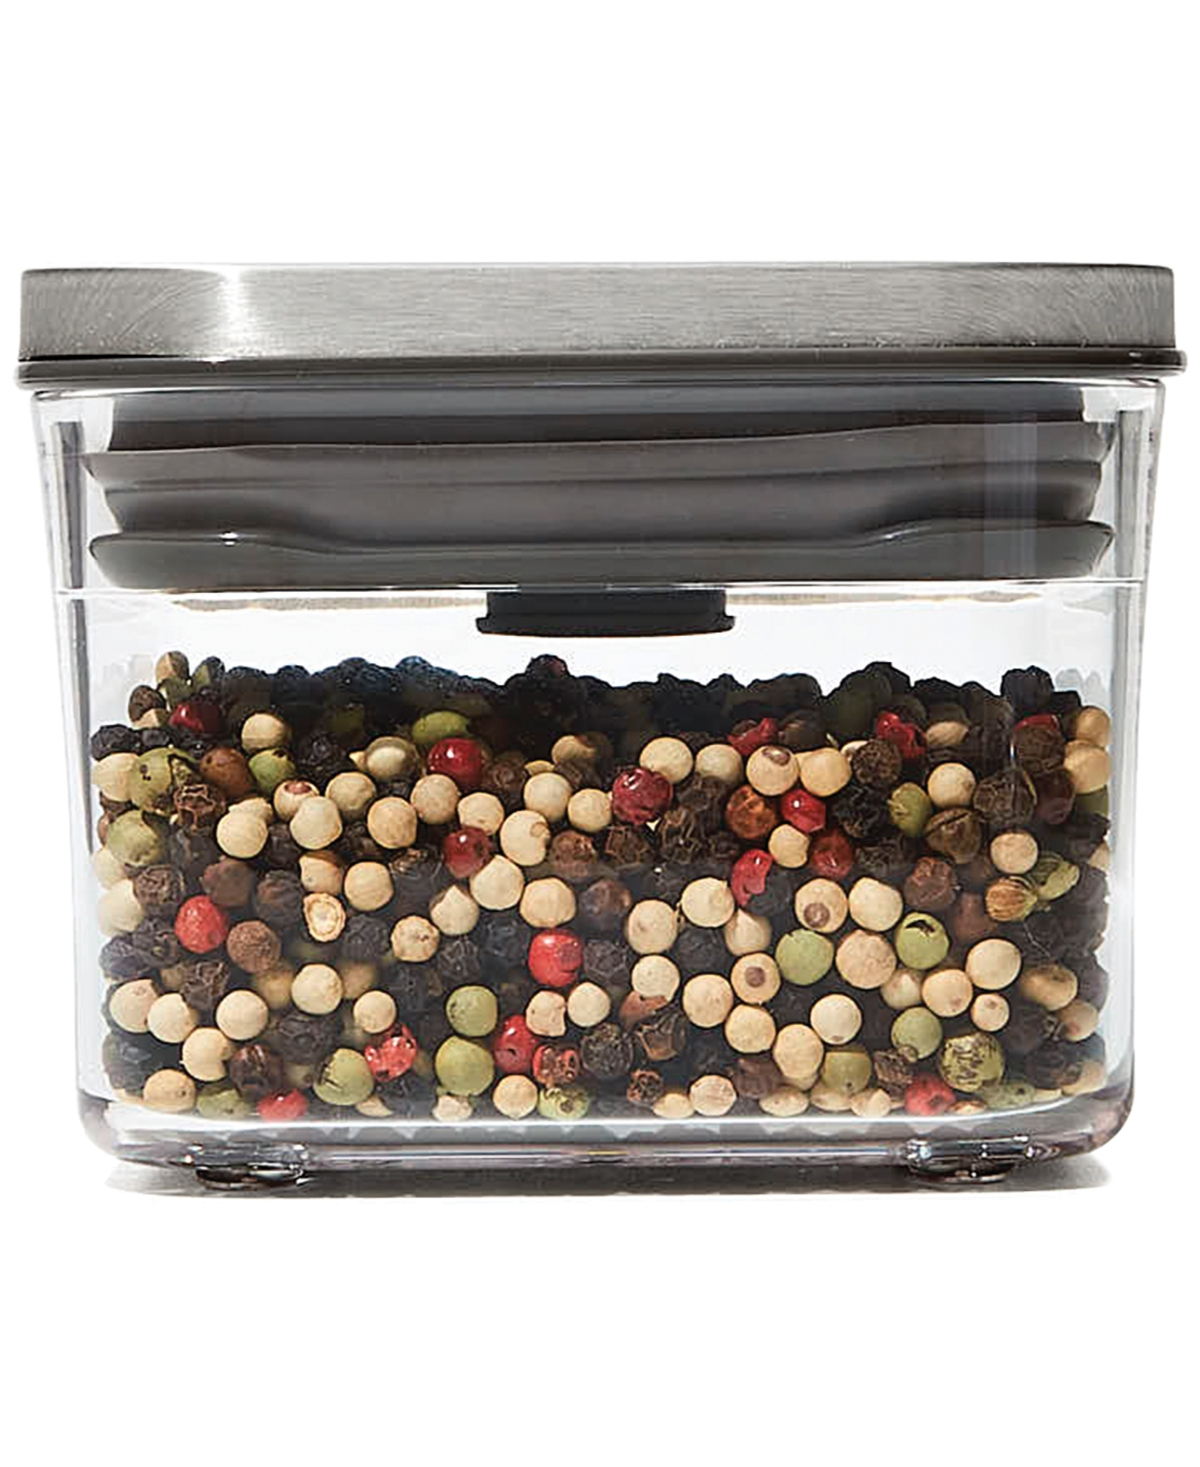 Oxo Steel Pop Small Square Mini 0.4-Qt. Food Storage Container